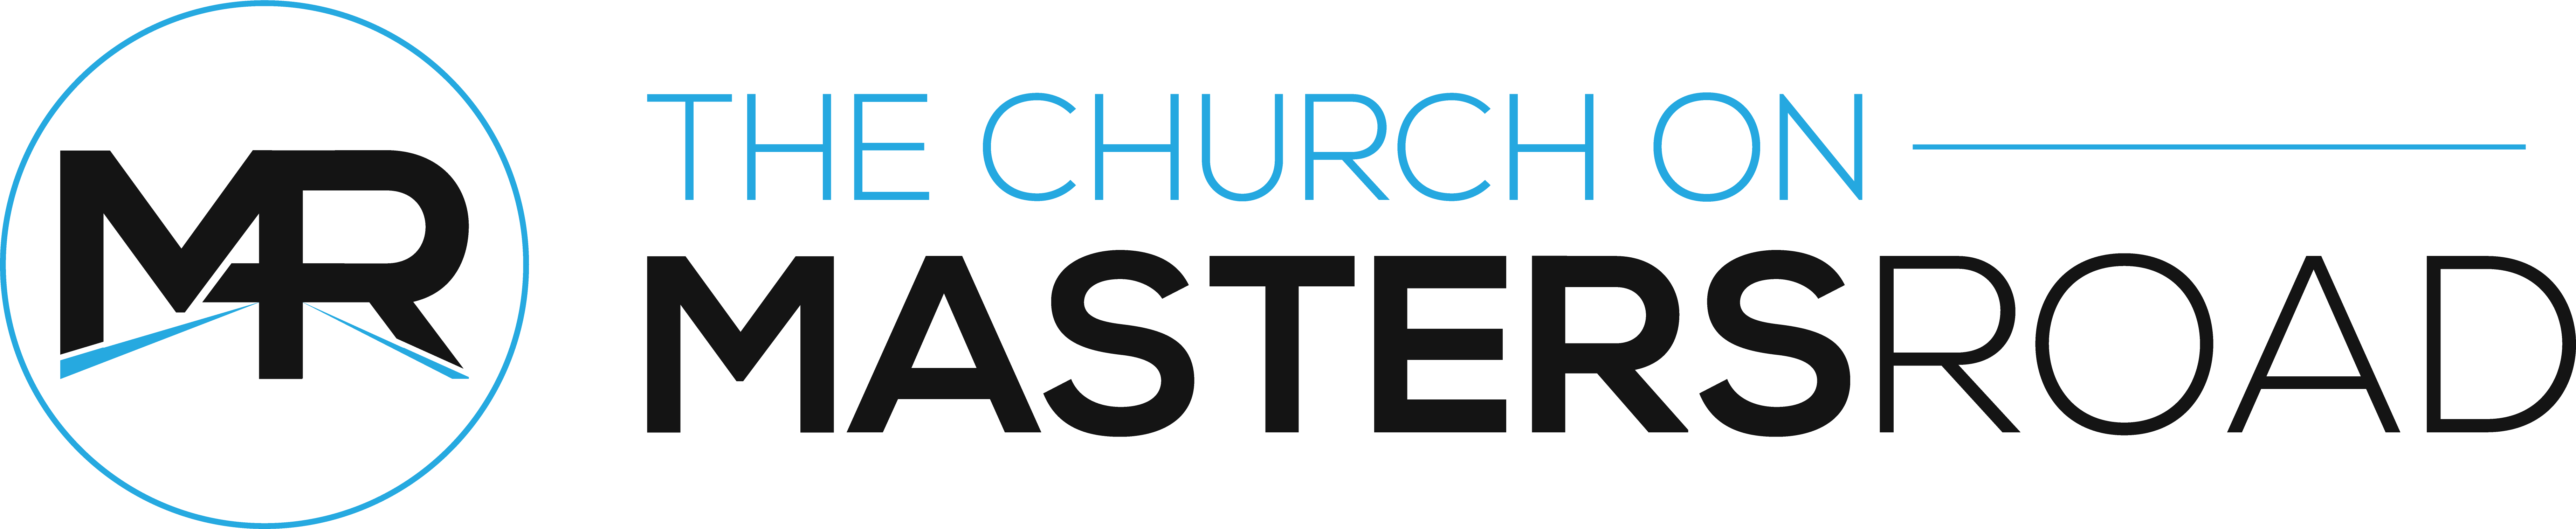 The Church on MastersRoad